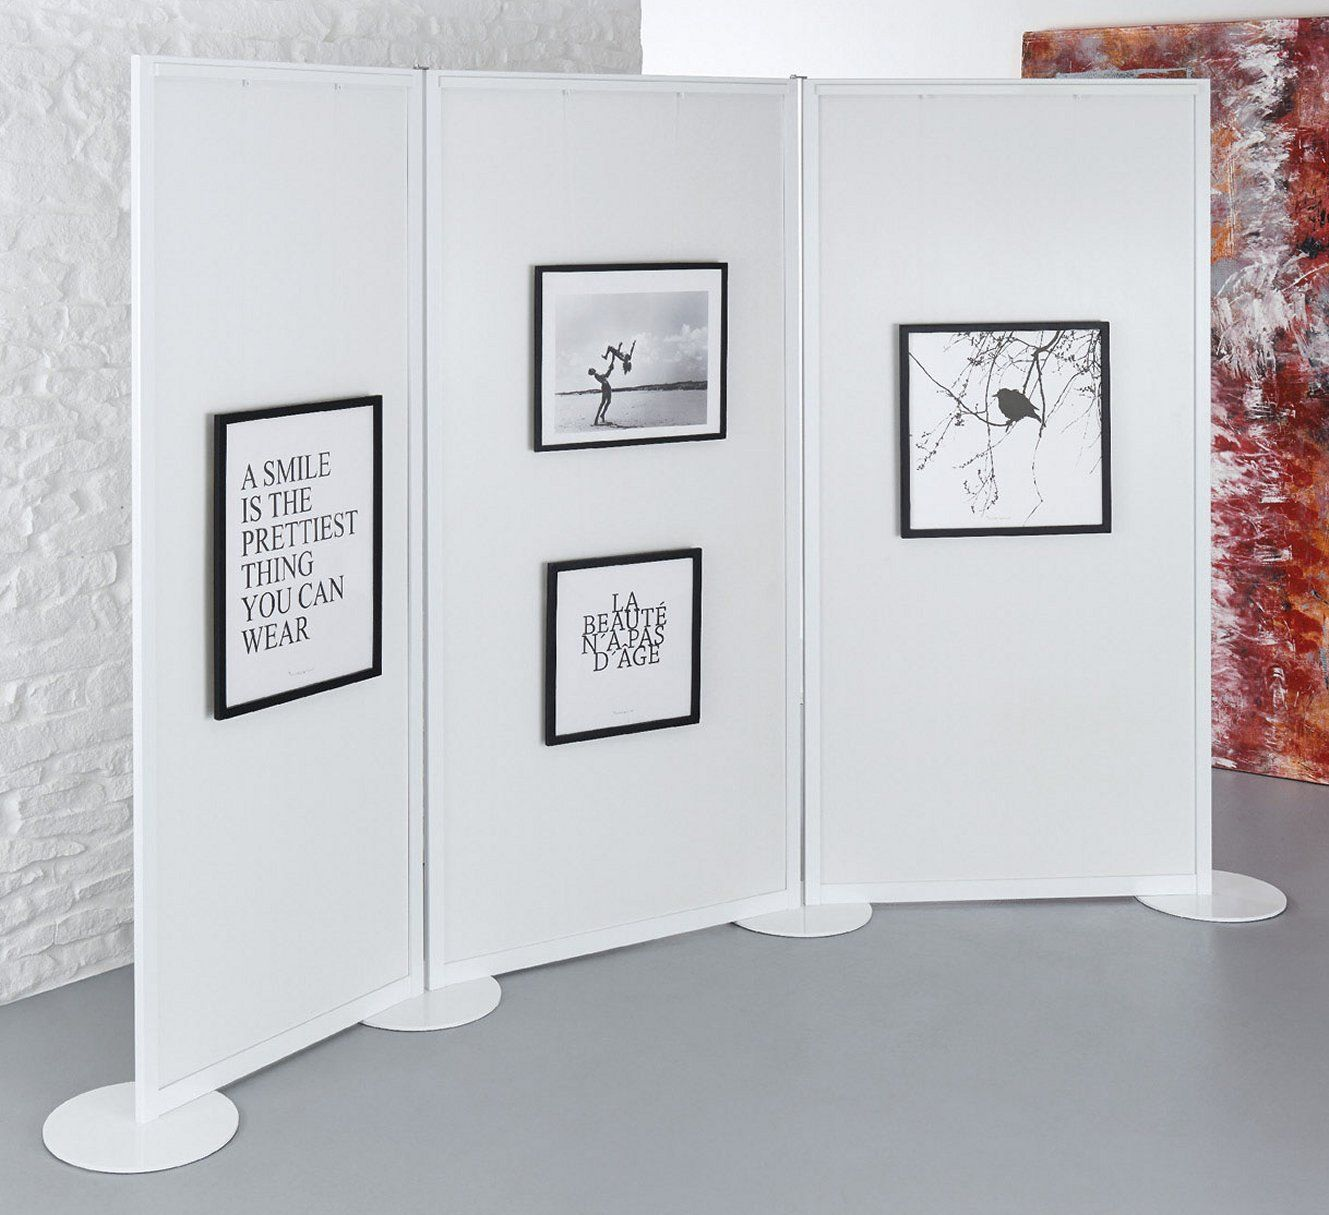 Galerie Stellwand Zum Aufhängen Von Bilderrahmen Winkelvariable Verkettbar Stellwand Wand Raumteiler